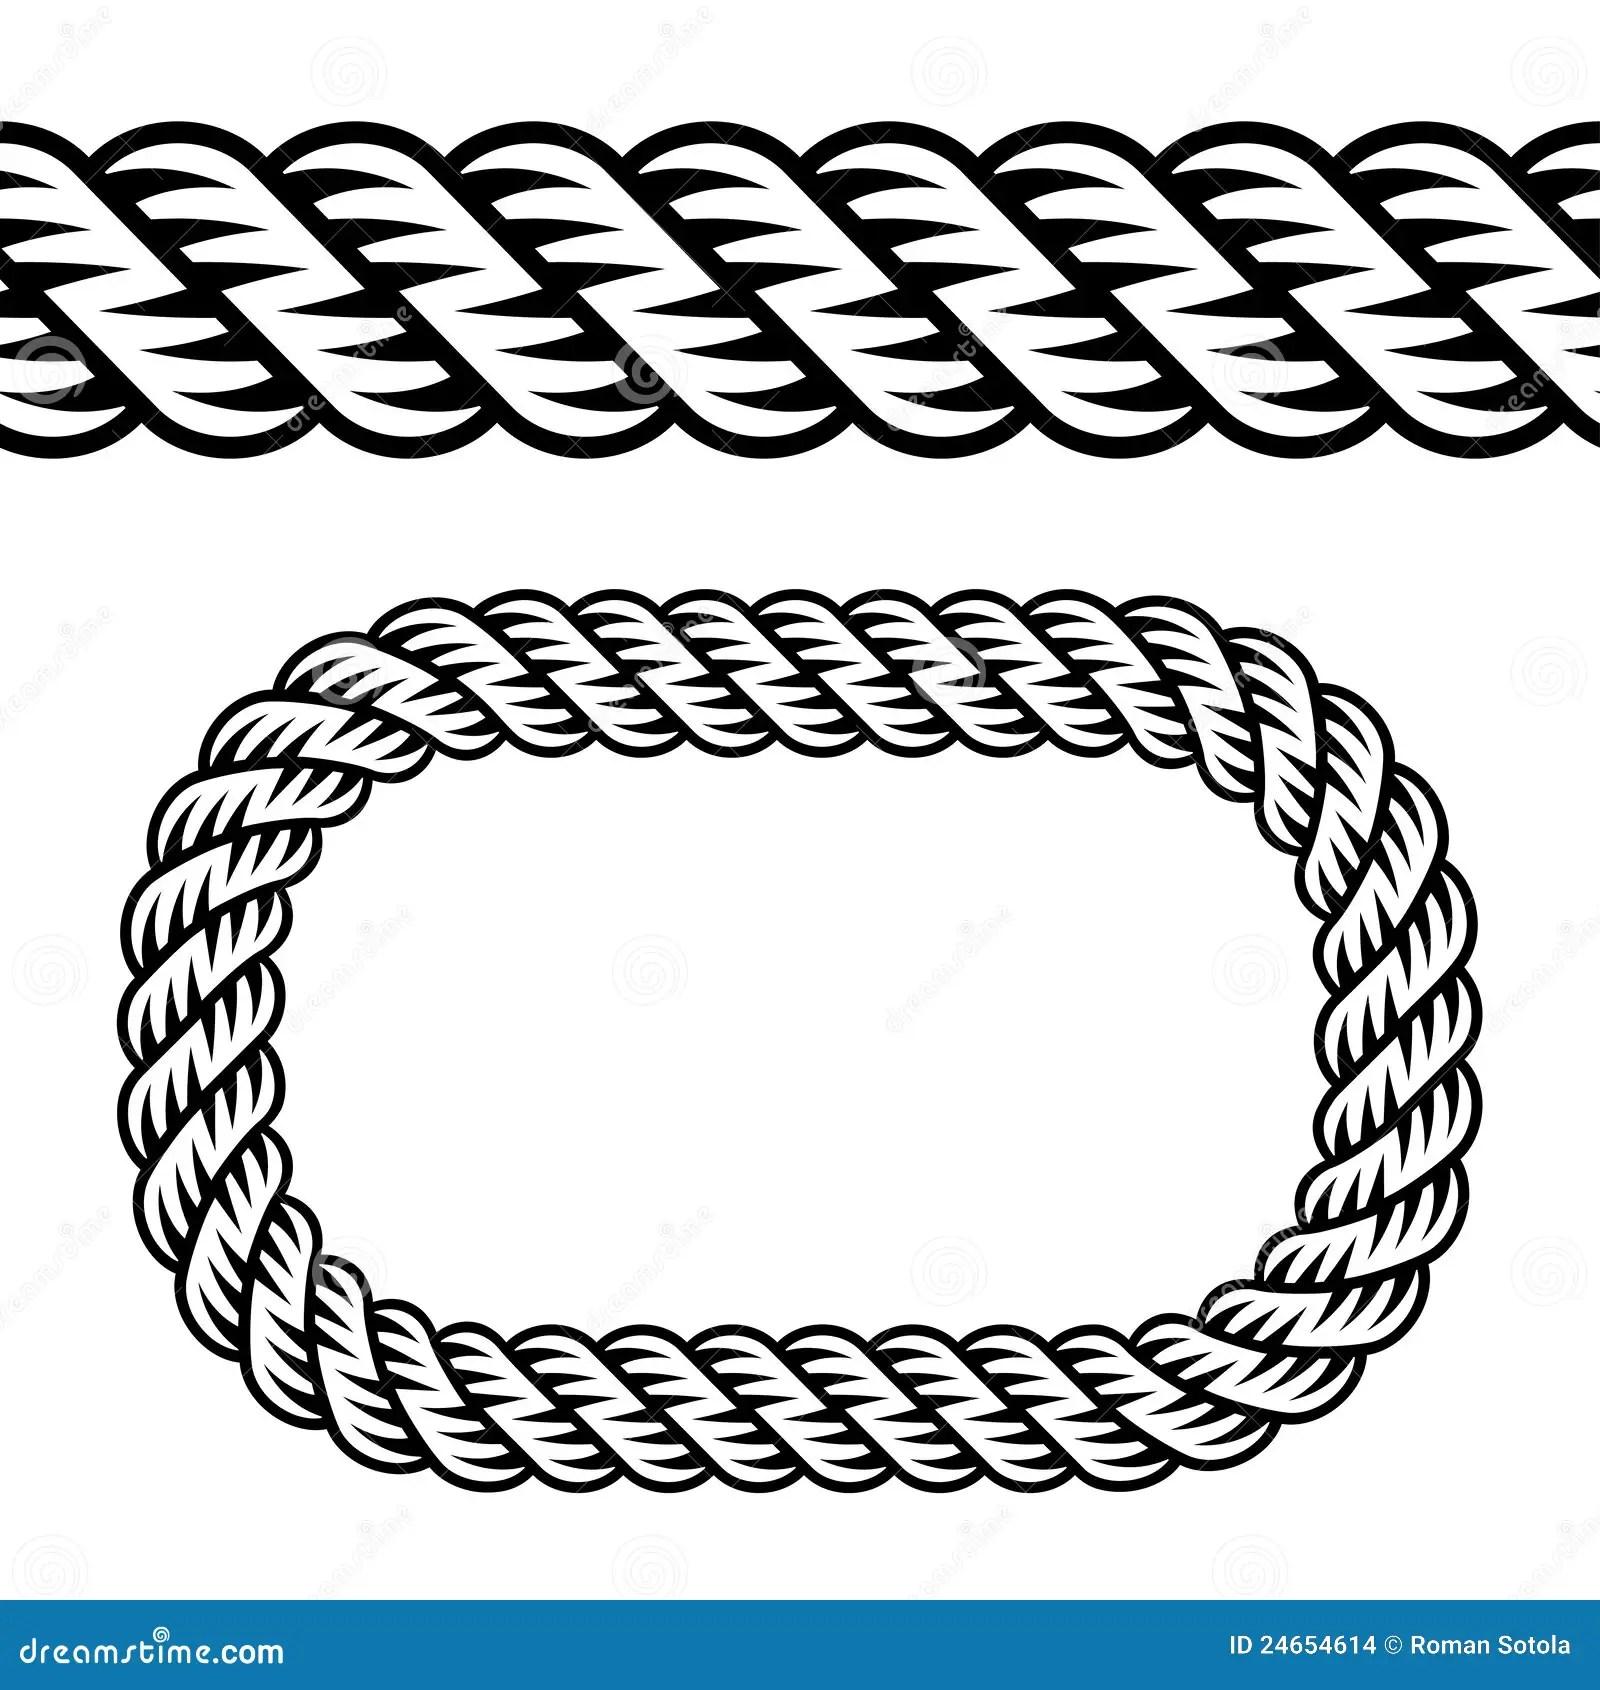 Seamless Black Rope Symbol Stock Vector Illustration Of